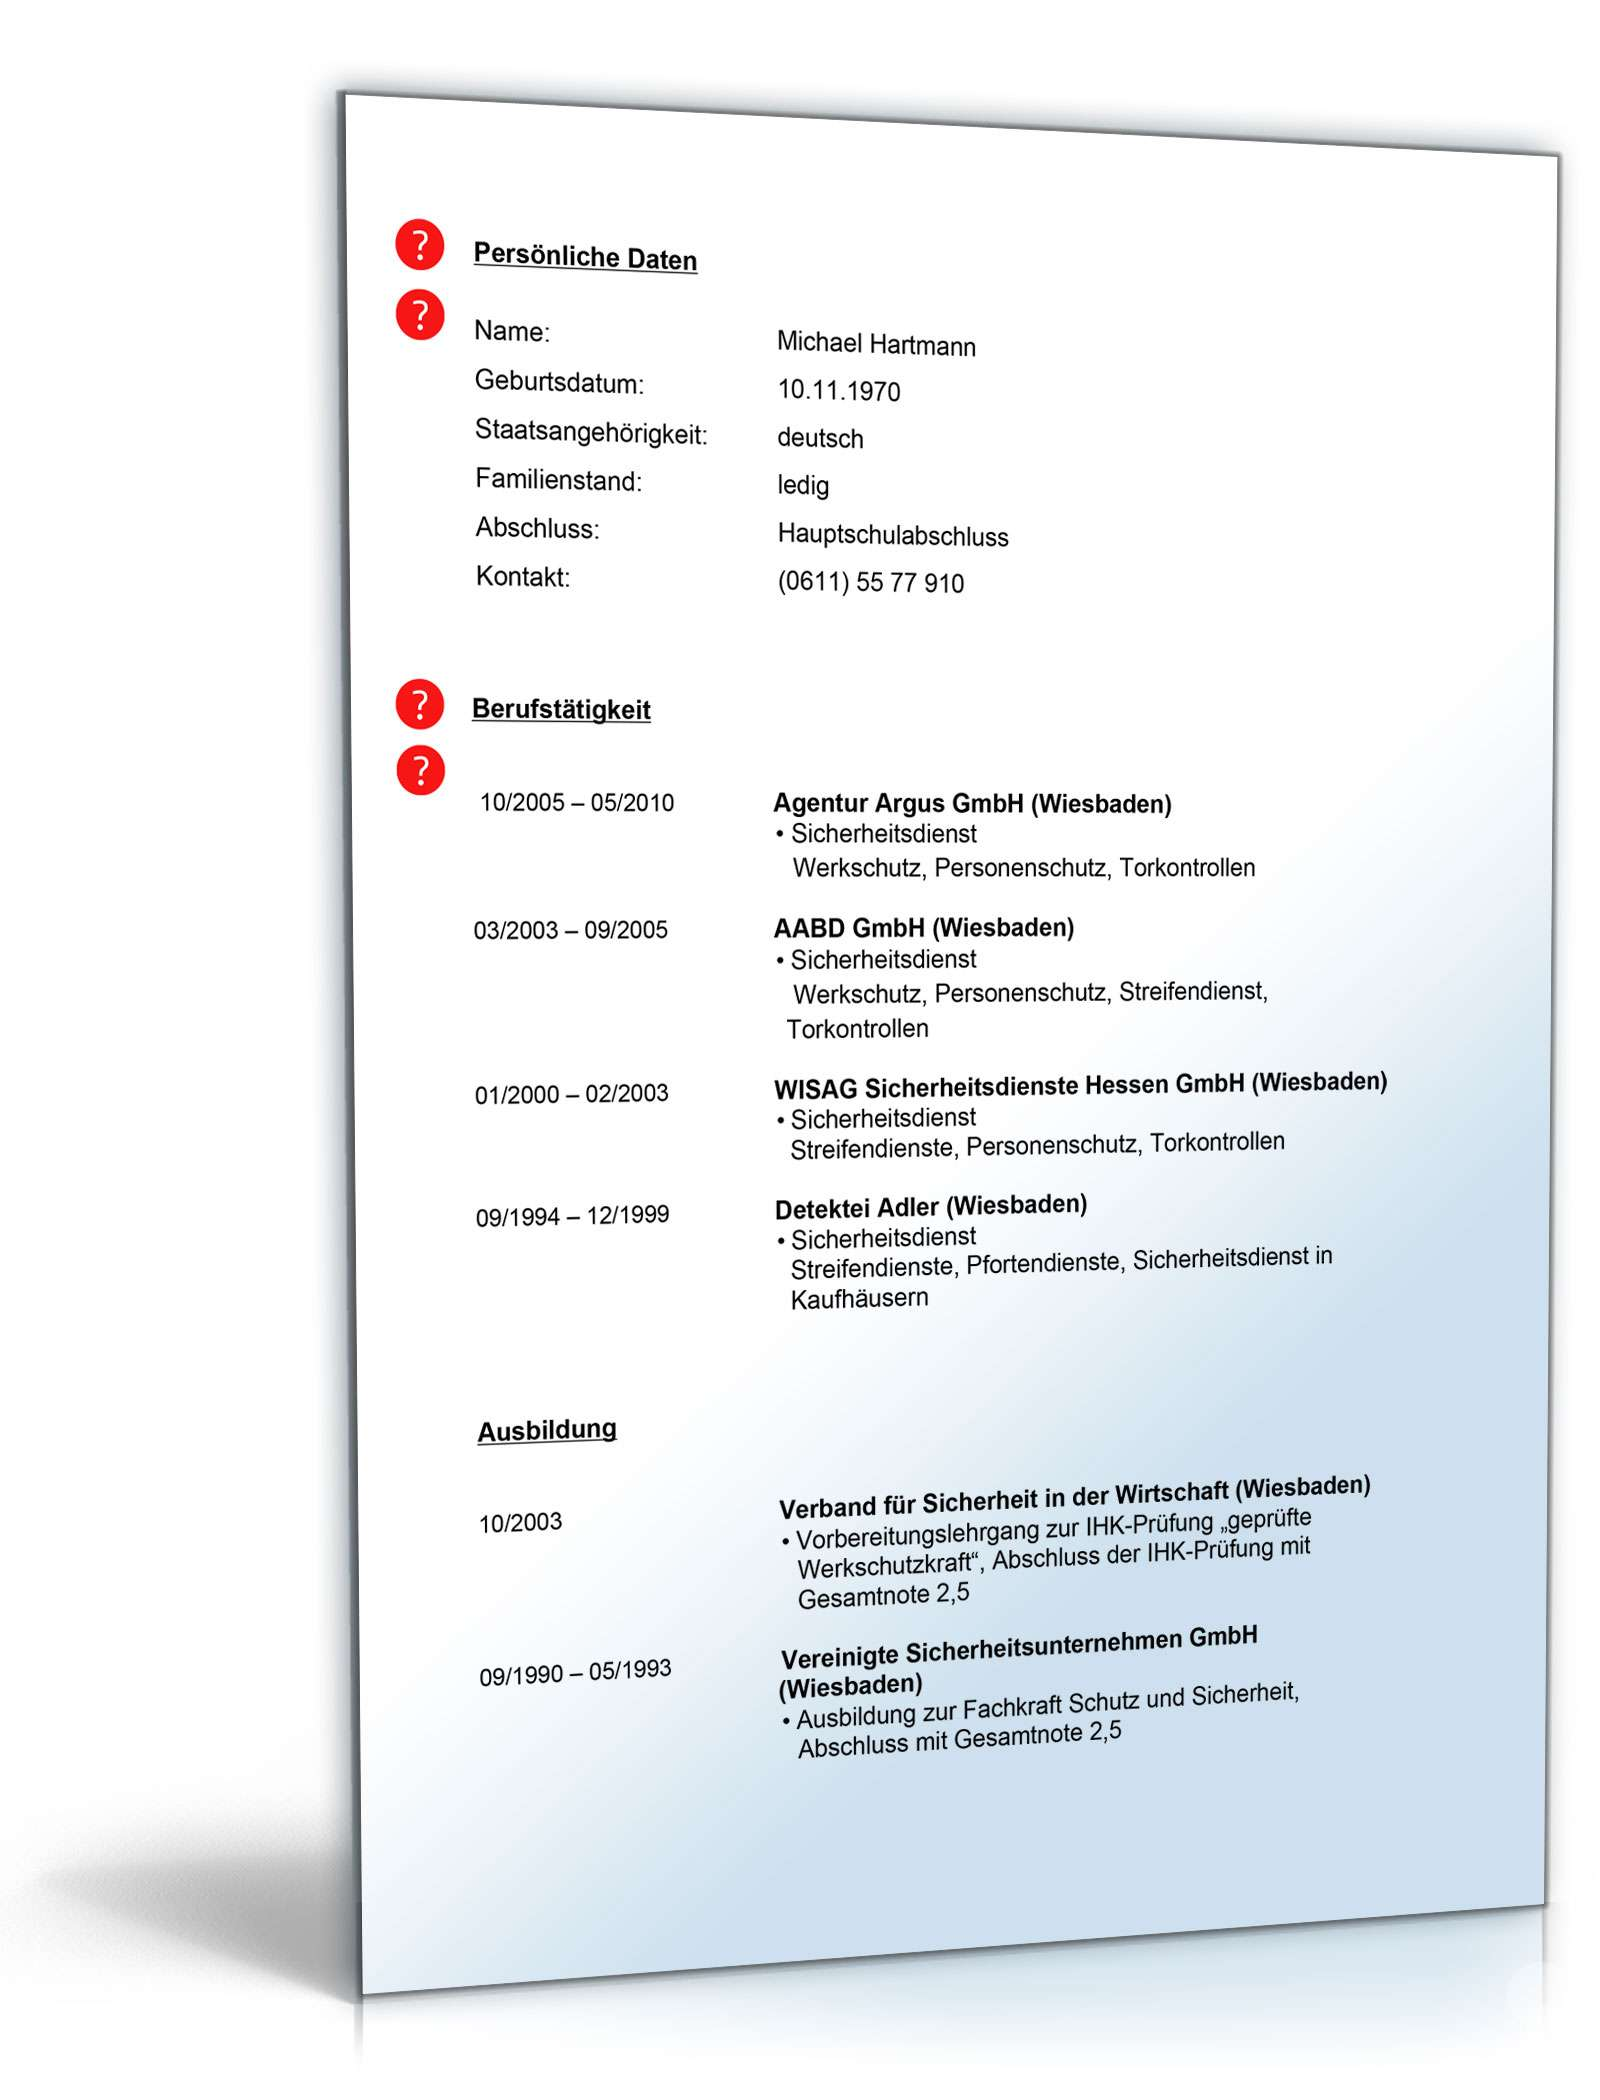 Fein Sicherheitsanalyst Lebenslauf Ideen - Entry Level Resume ...